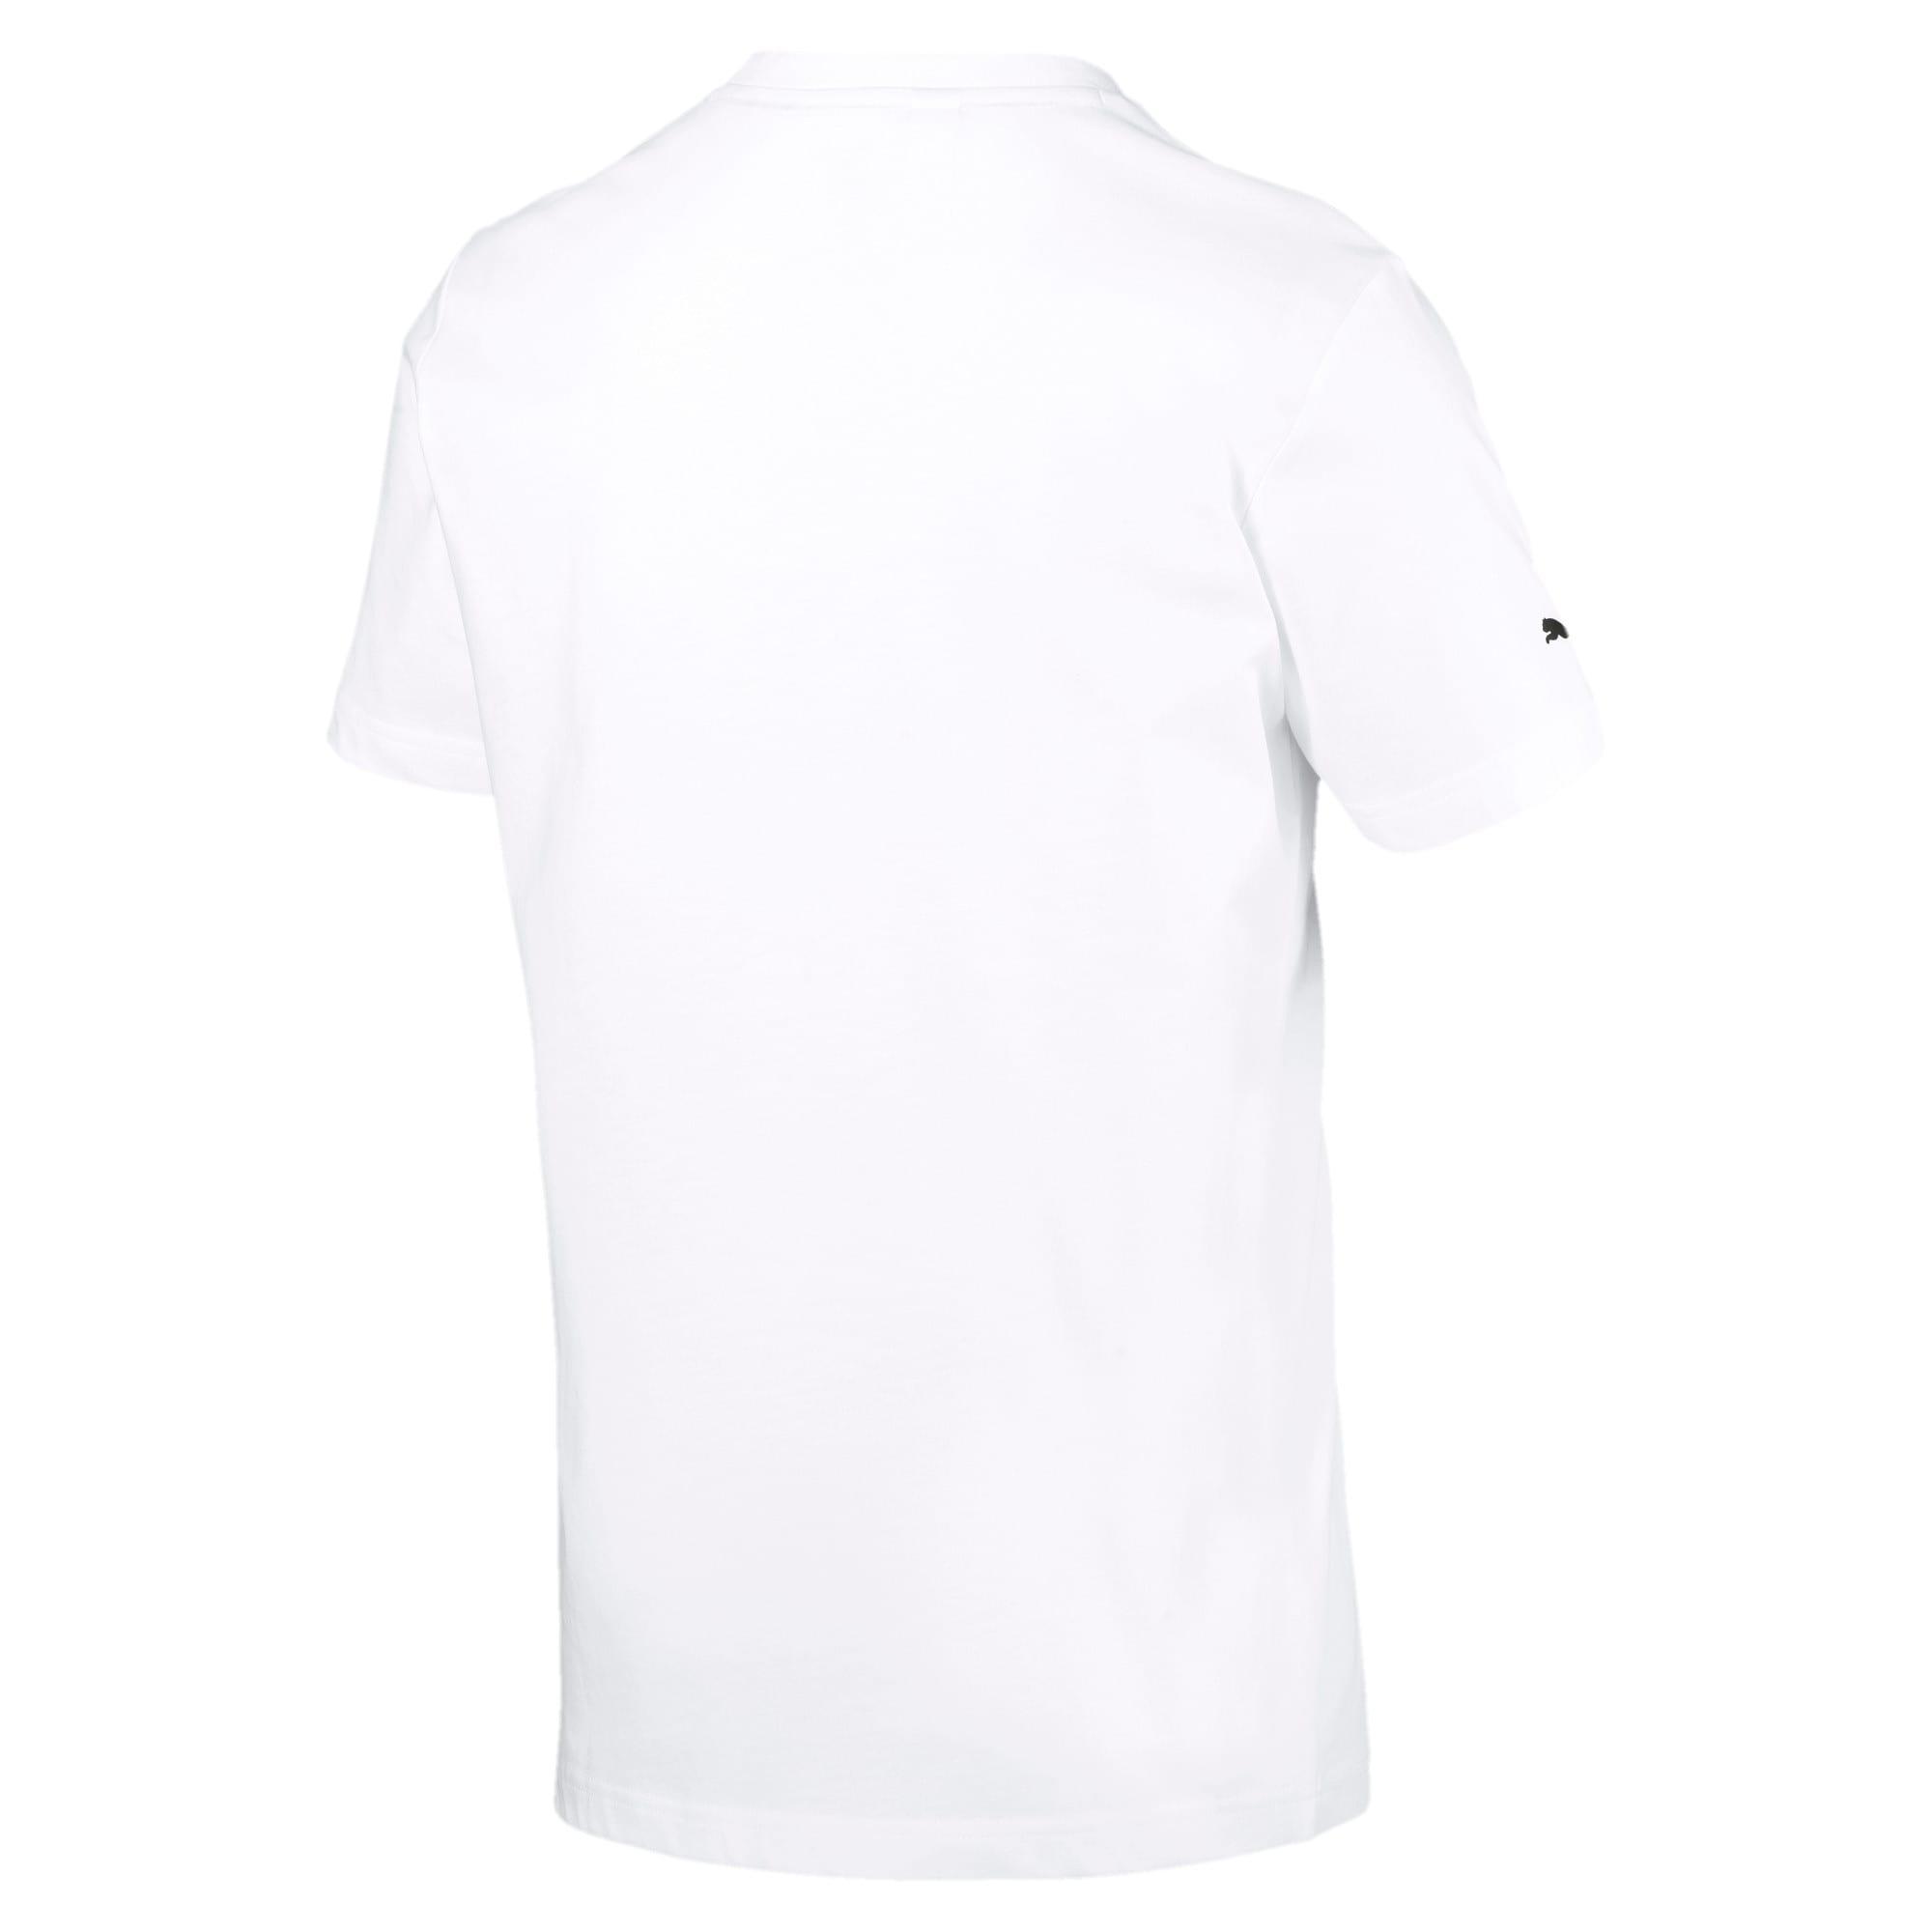 Thumbnail 5 of T-shirt con logo BMW M Motorsport uomo, Puma White, medium